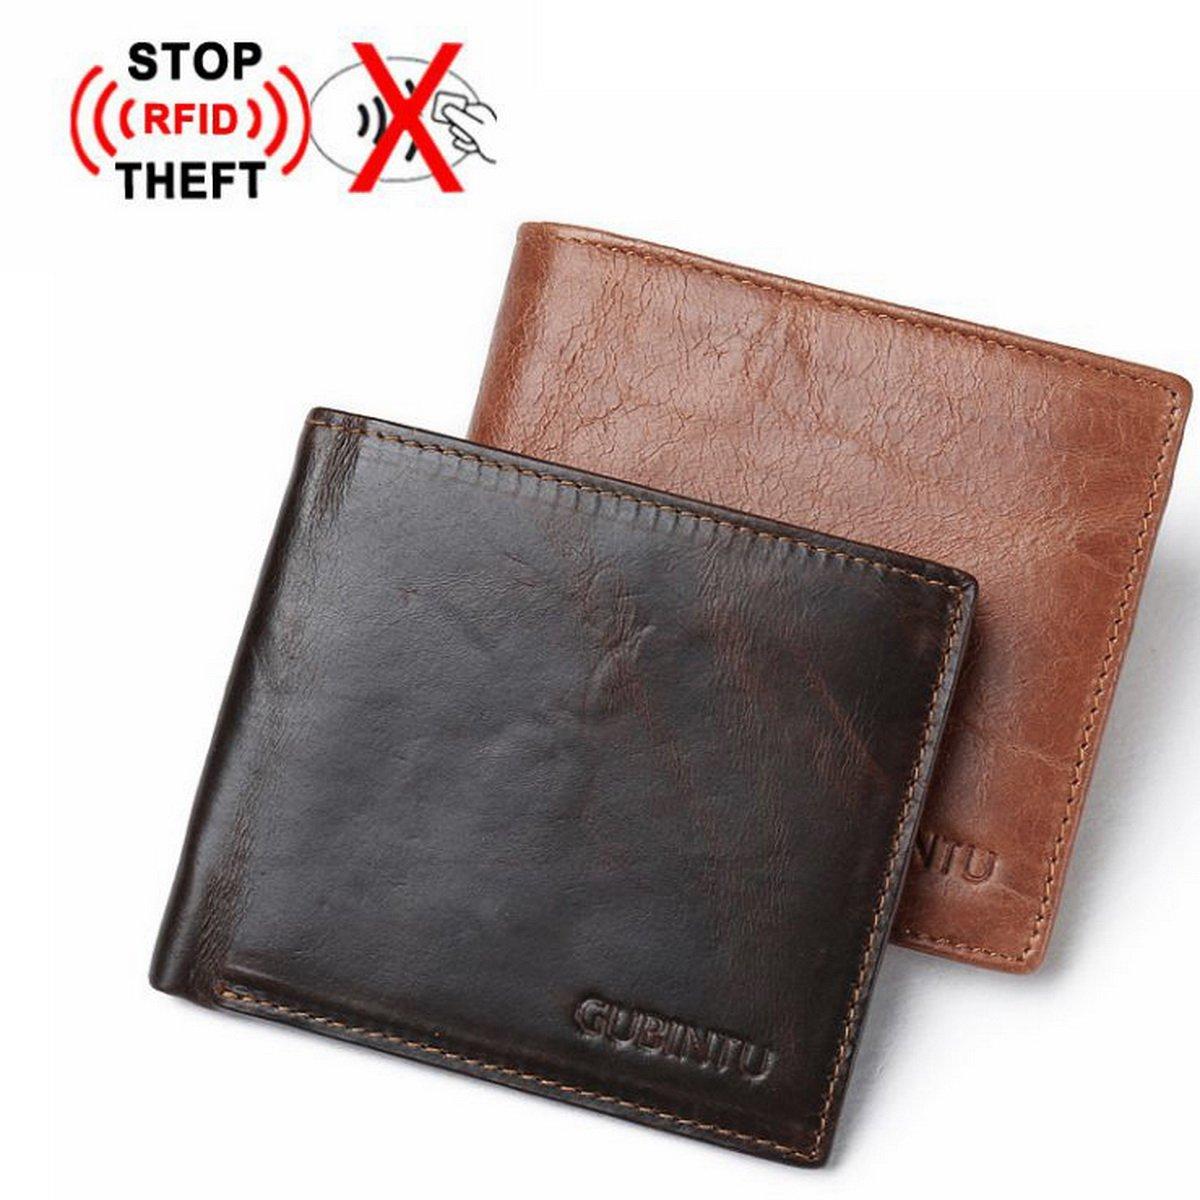 Genuine Leather RFID Blocking Wallet Purse Bifold Men Credit Card Holder Pocket Wallet Anti Scan ID Window Slim Lightweight (Coffee)